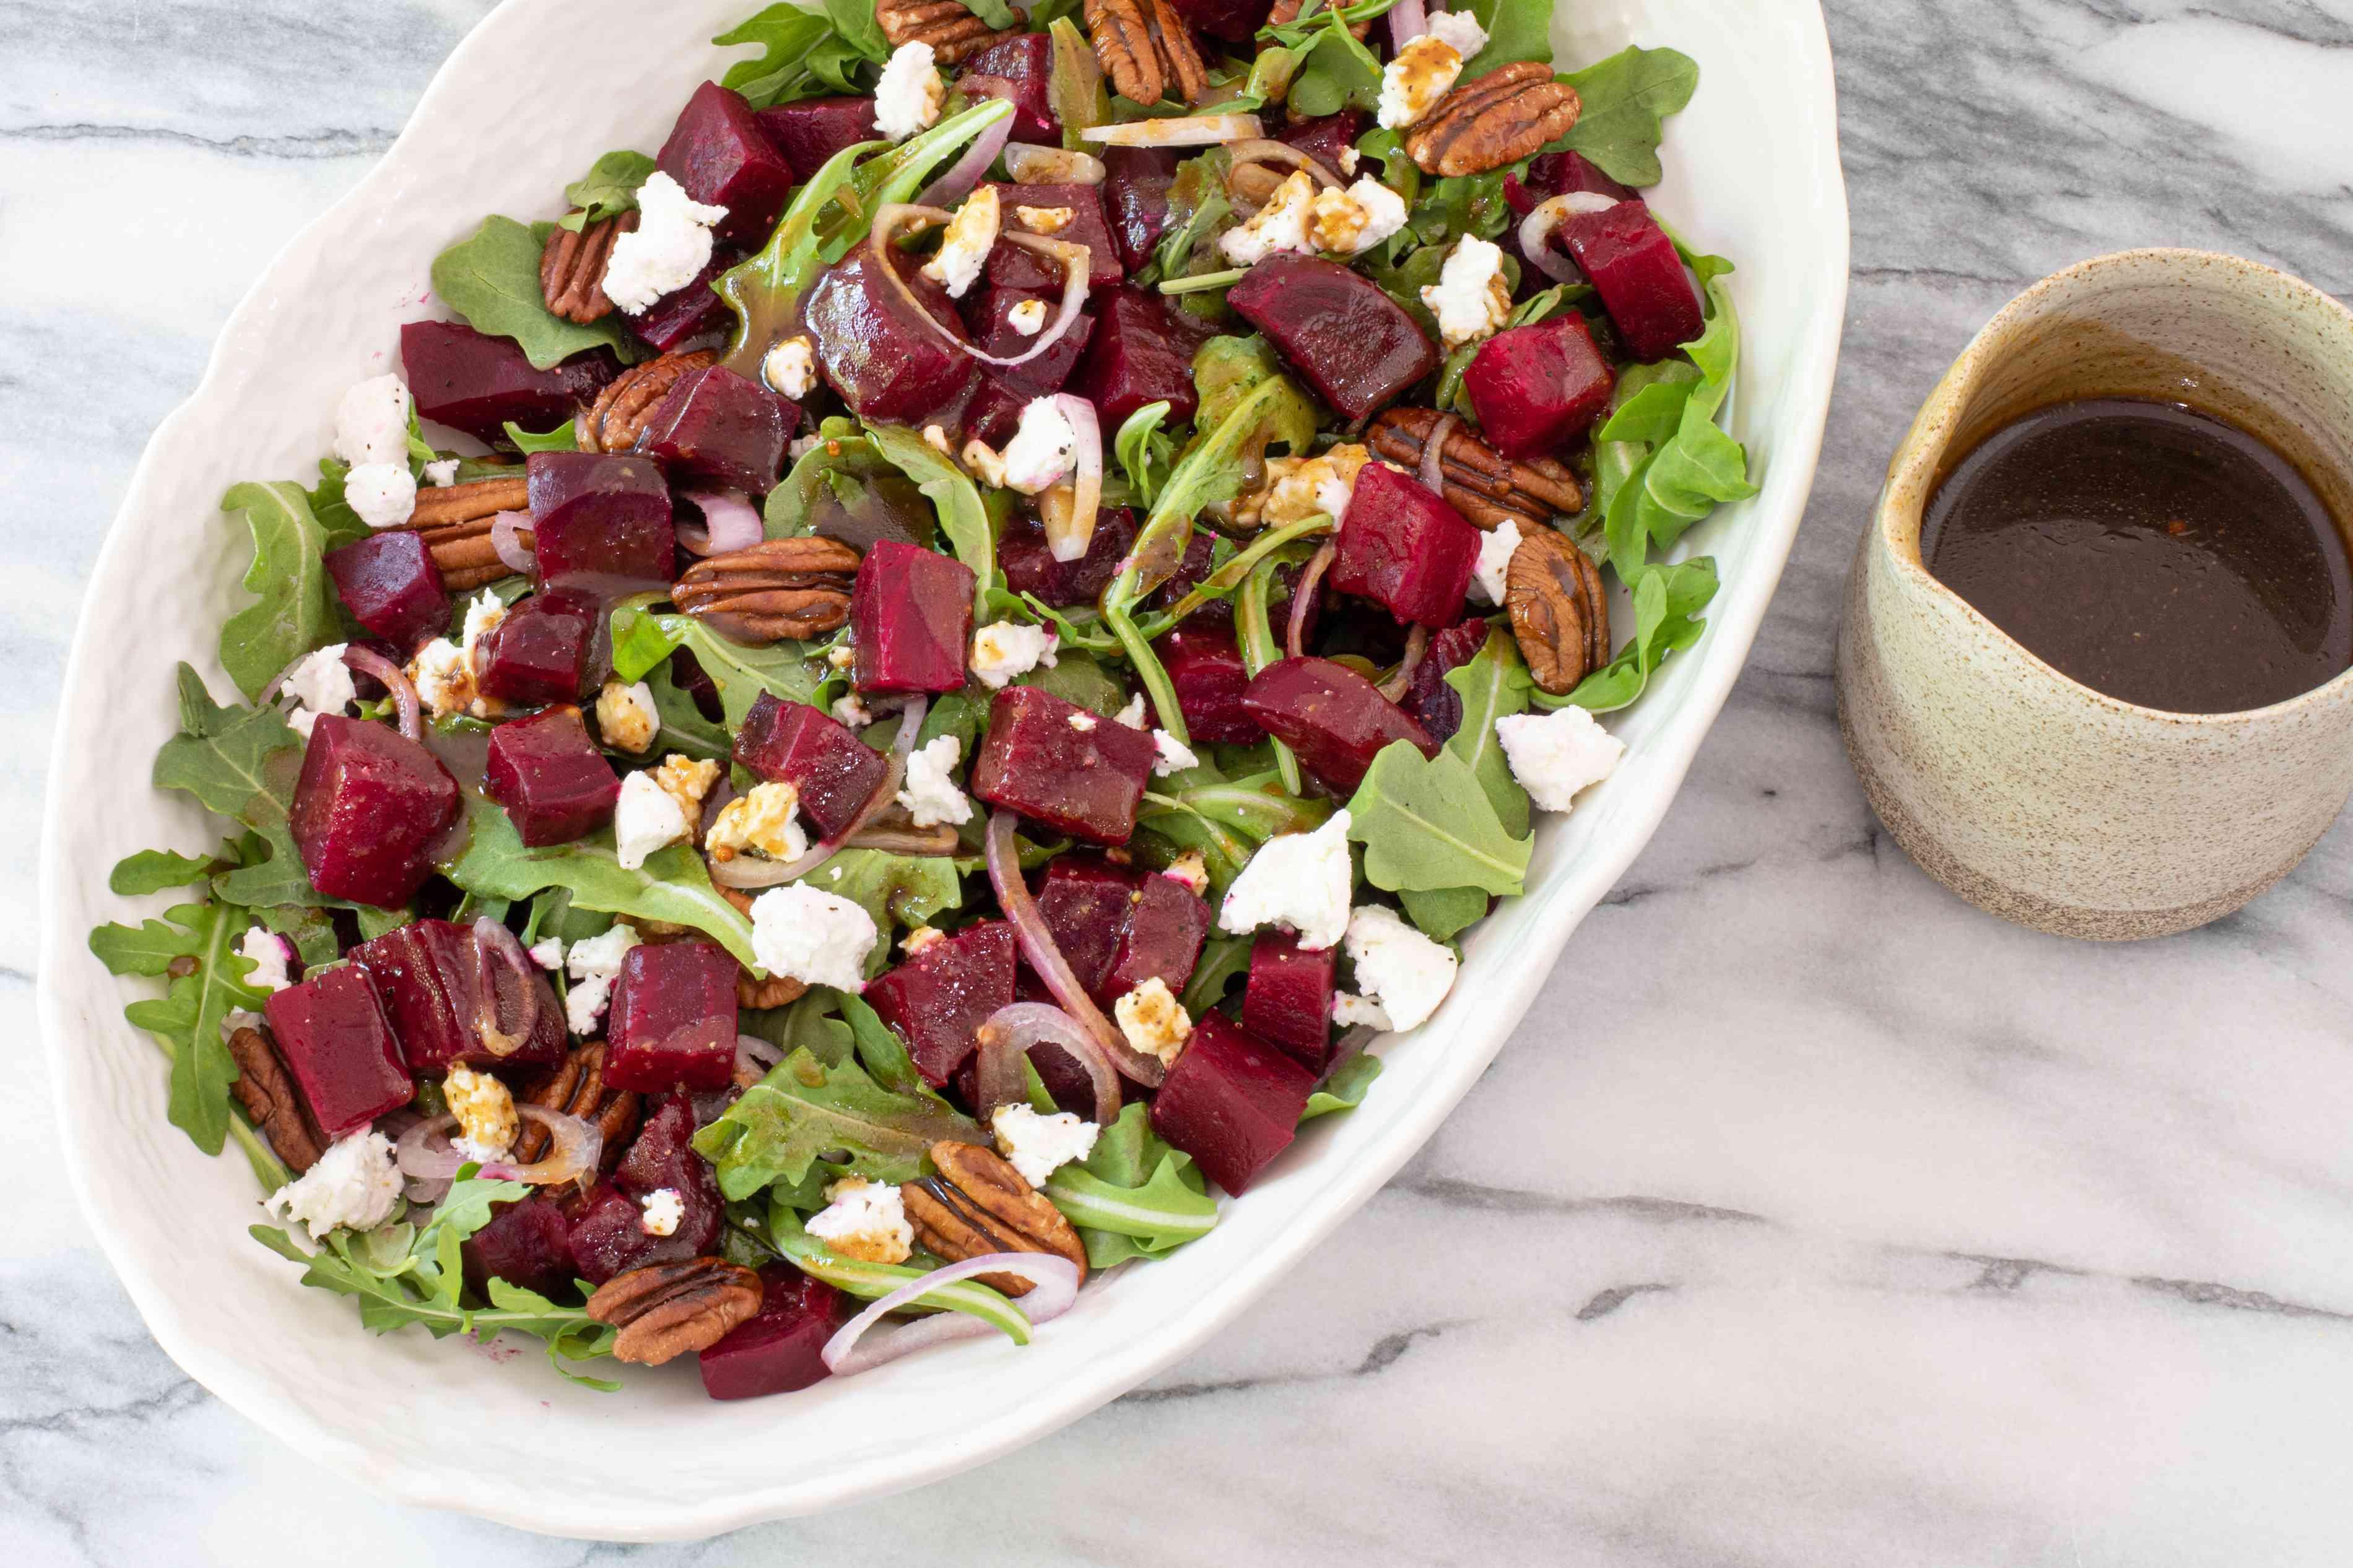 Beet salad with honey balsamic vinaigrette.